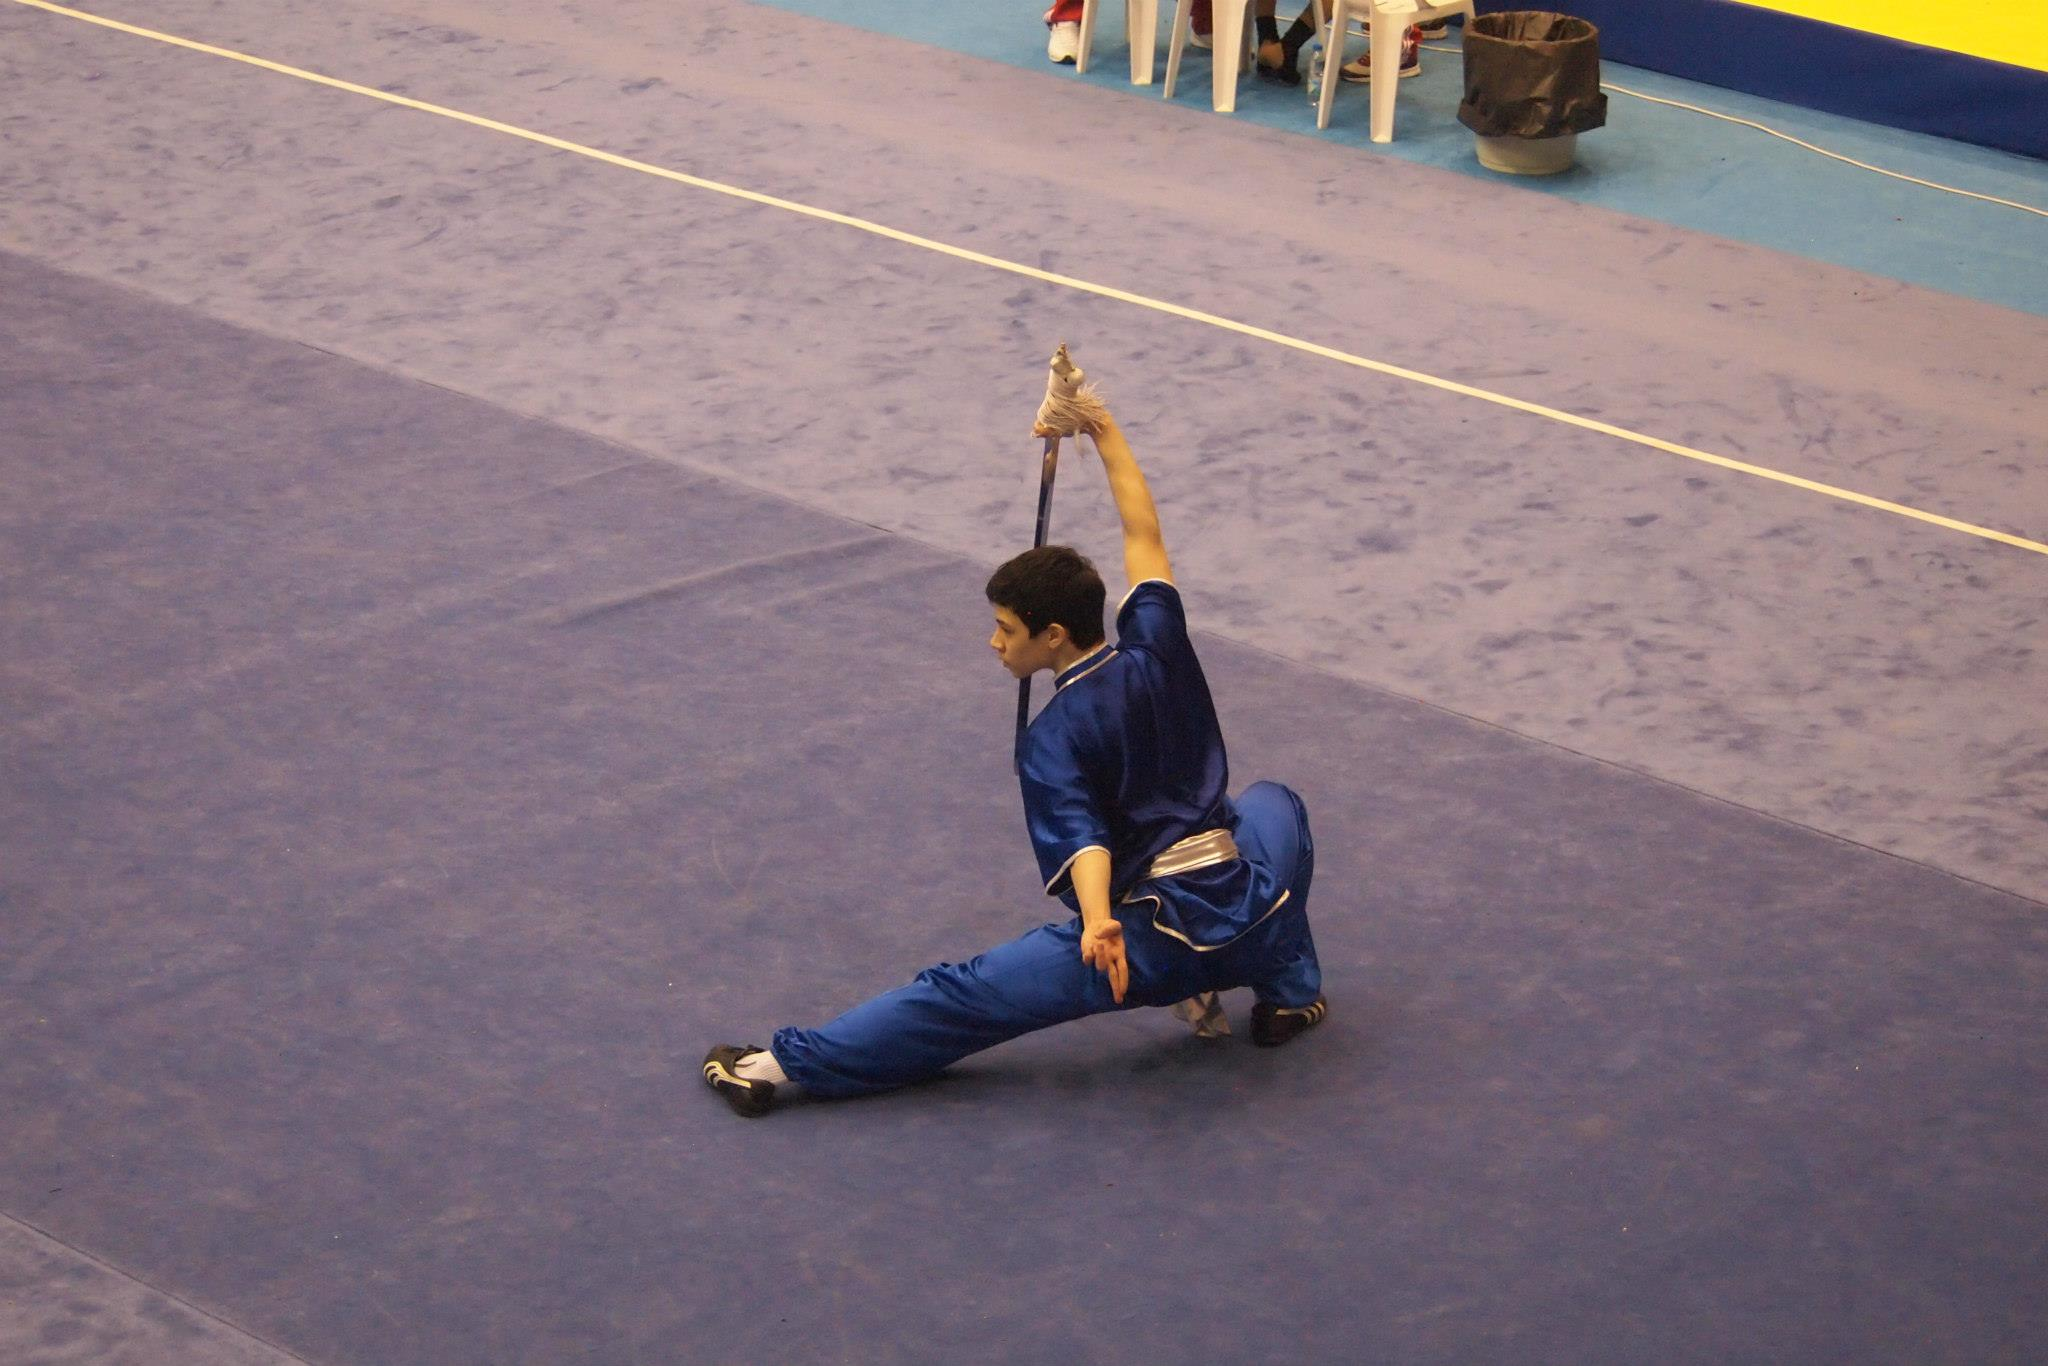 Nima_Wayland_Li_Wushu_Straight_Sword_Jianshu_World_Junior_Championships_2014_Turkey.jpg